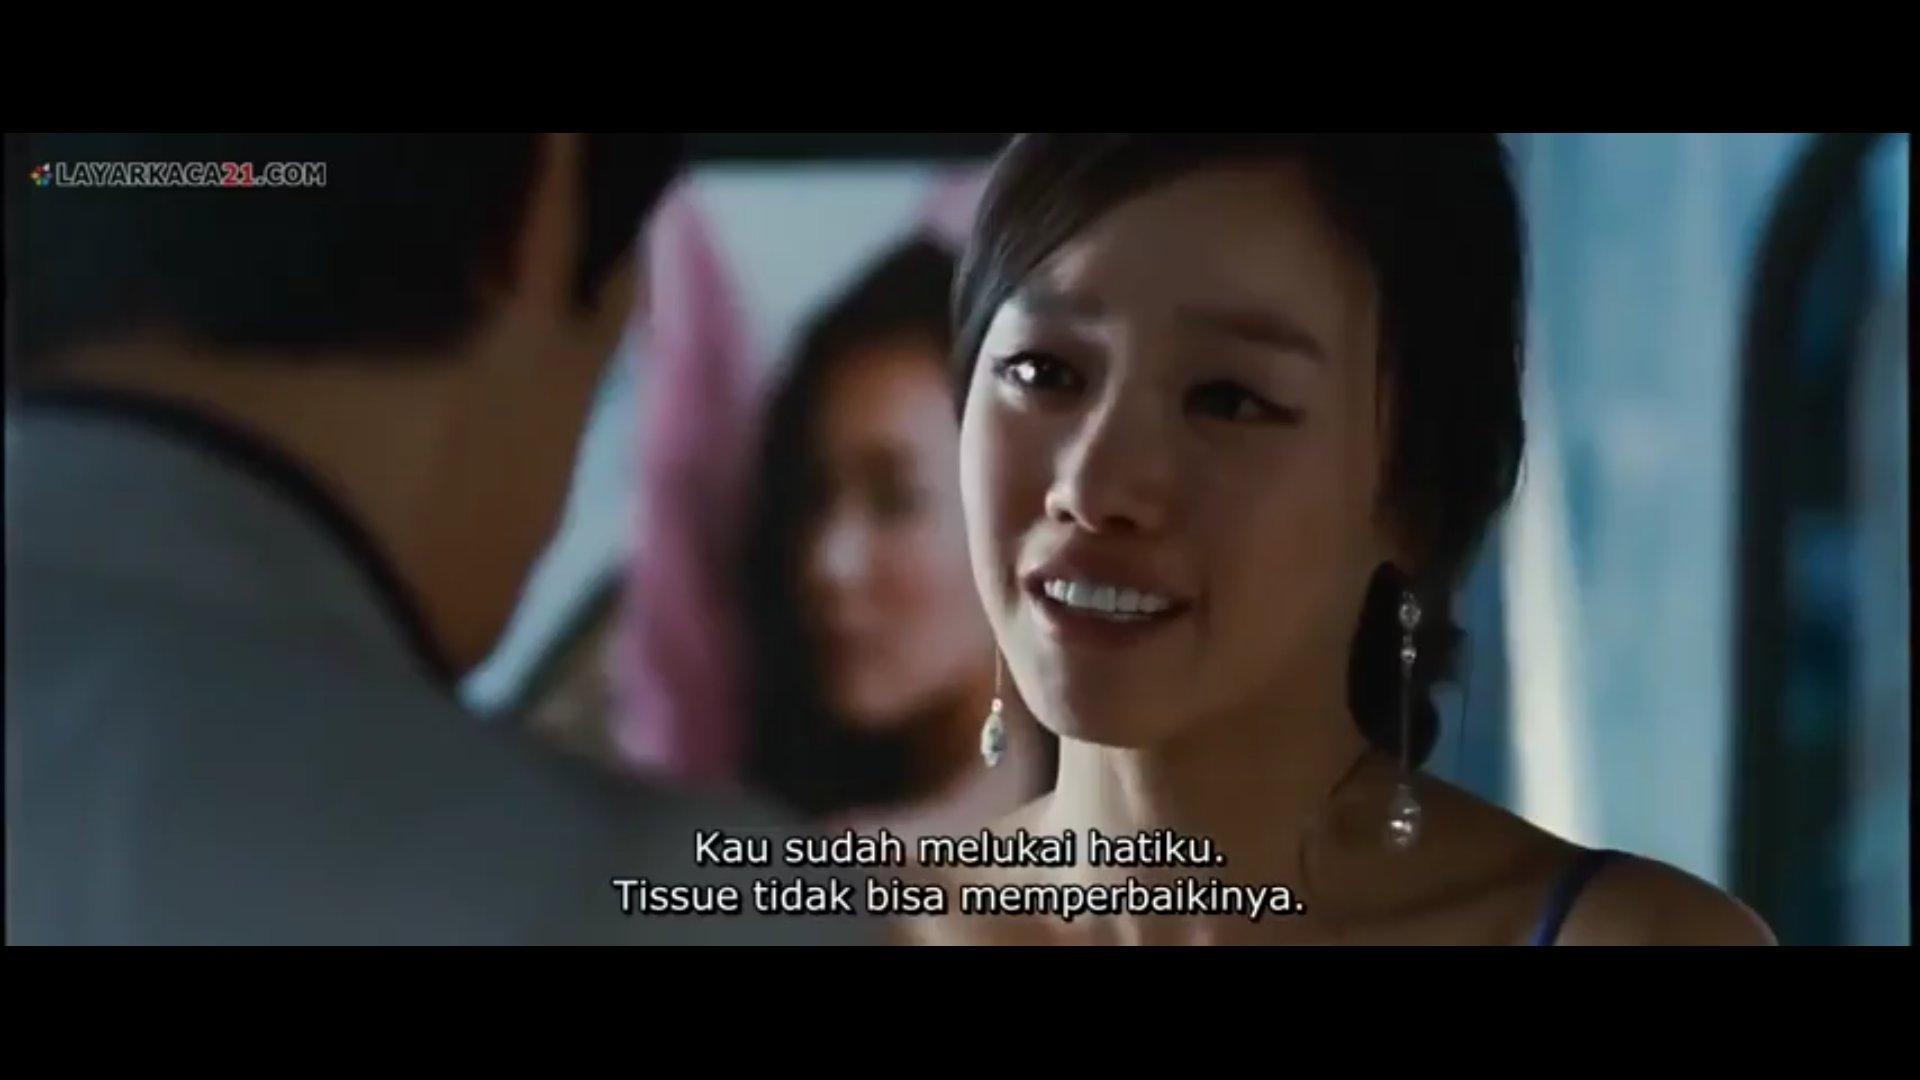 10 Dialog drama Korea galau soal cinta, lucunya bikin senyum ngenes